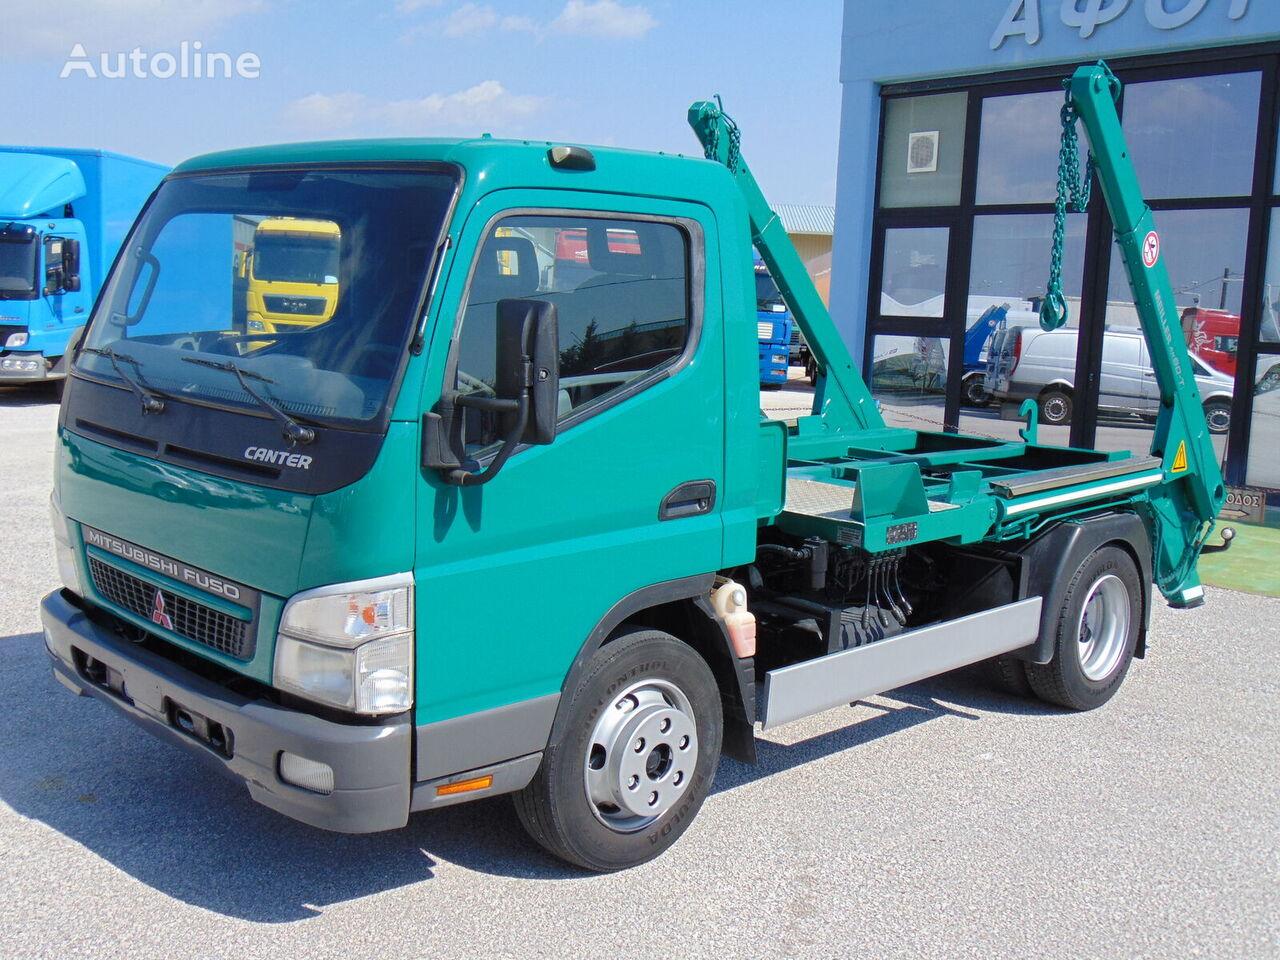 MITSUBISHI FUSO CANTER FE85 kamion autopodizač kontejnera